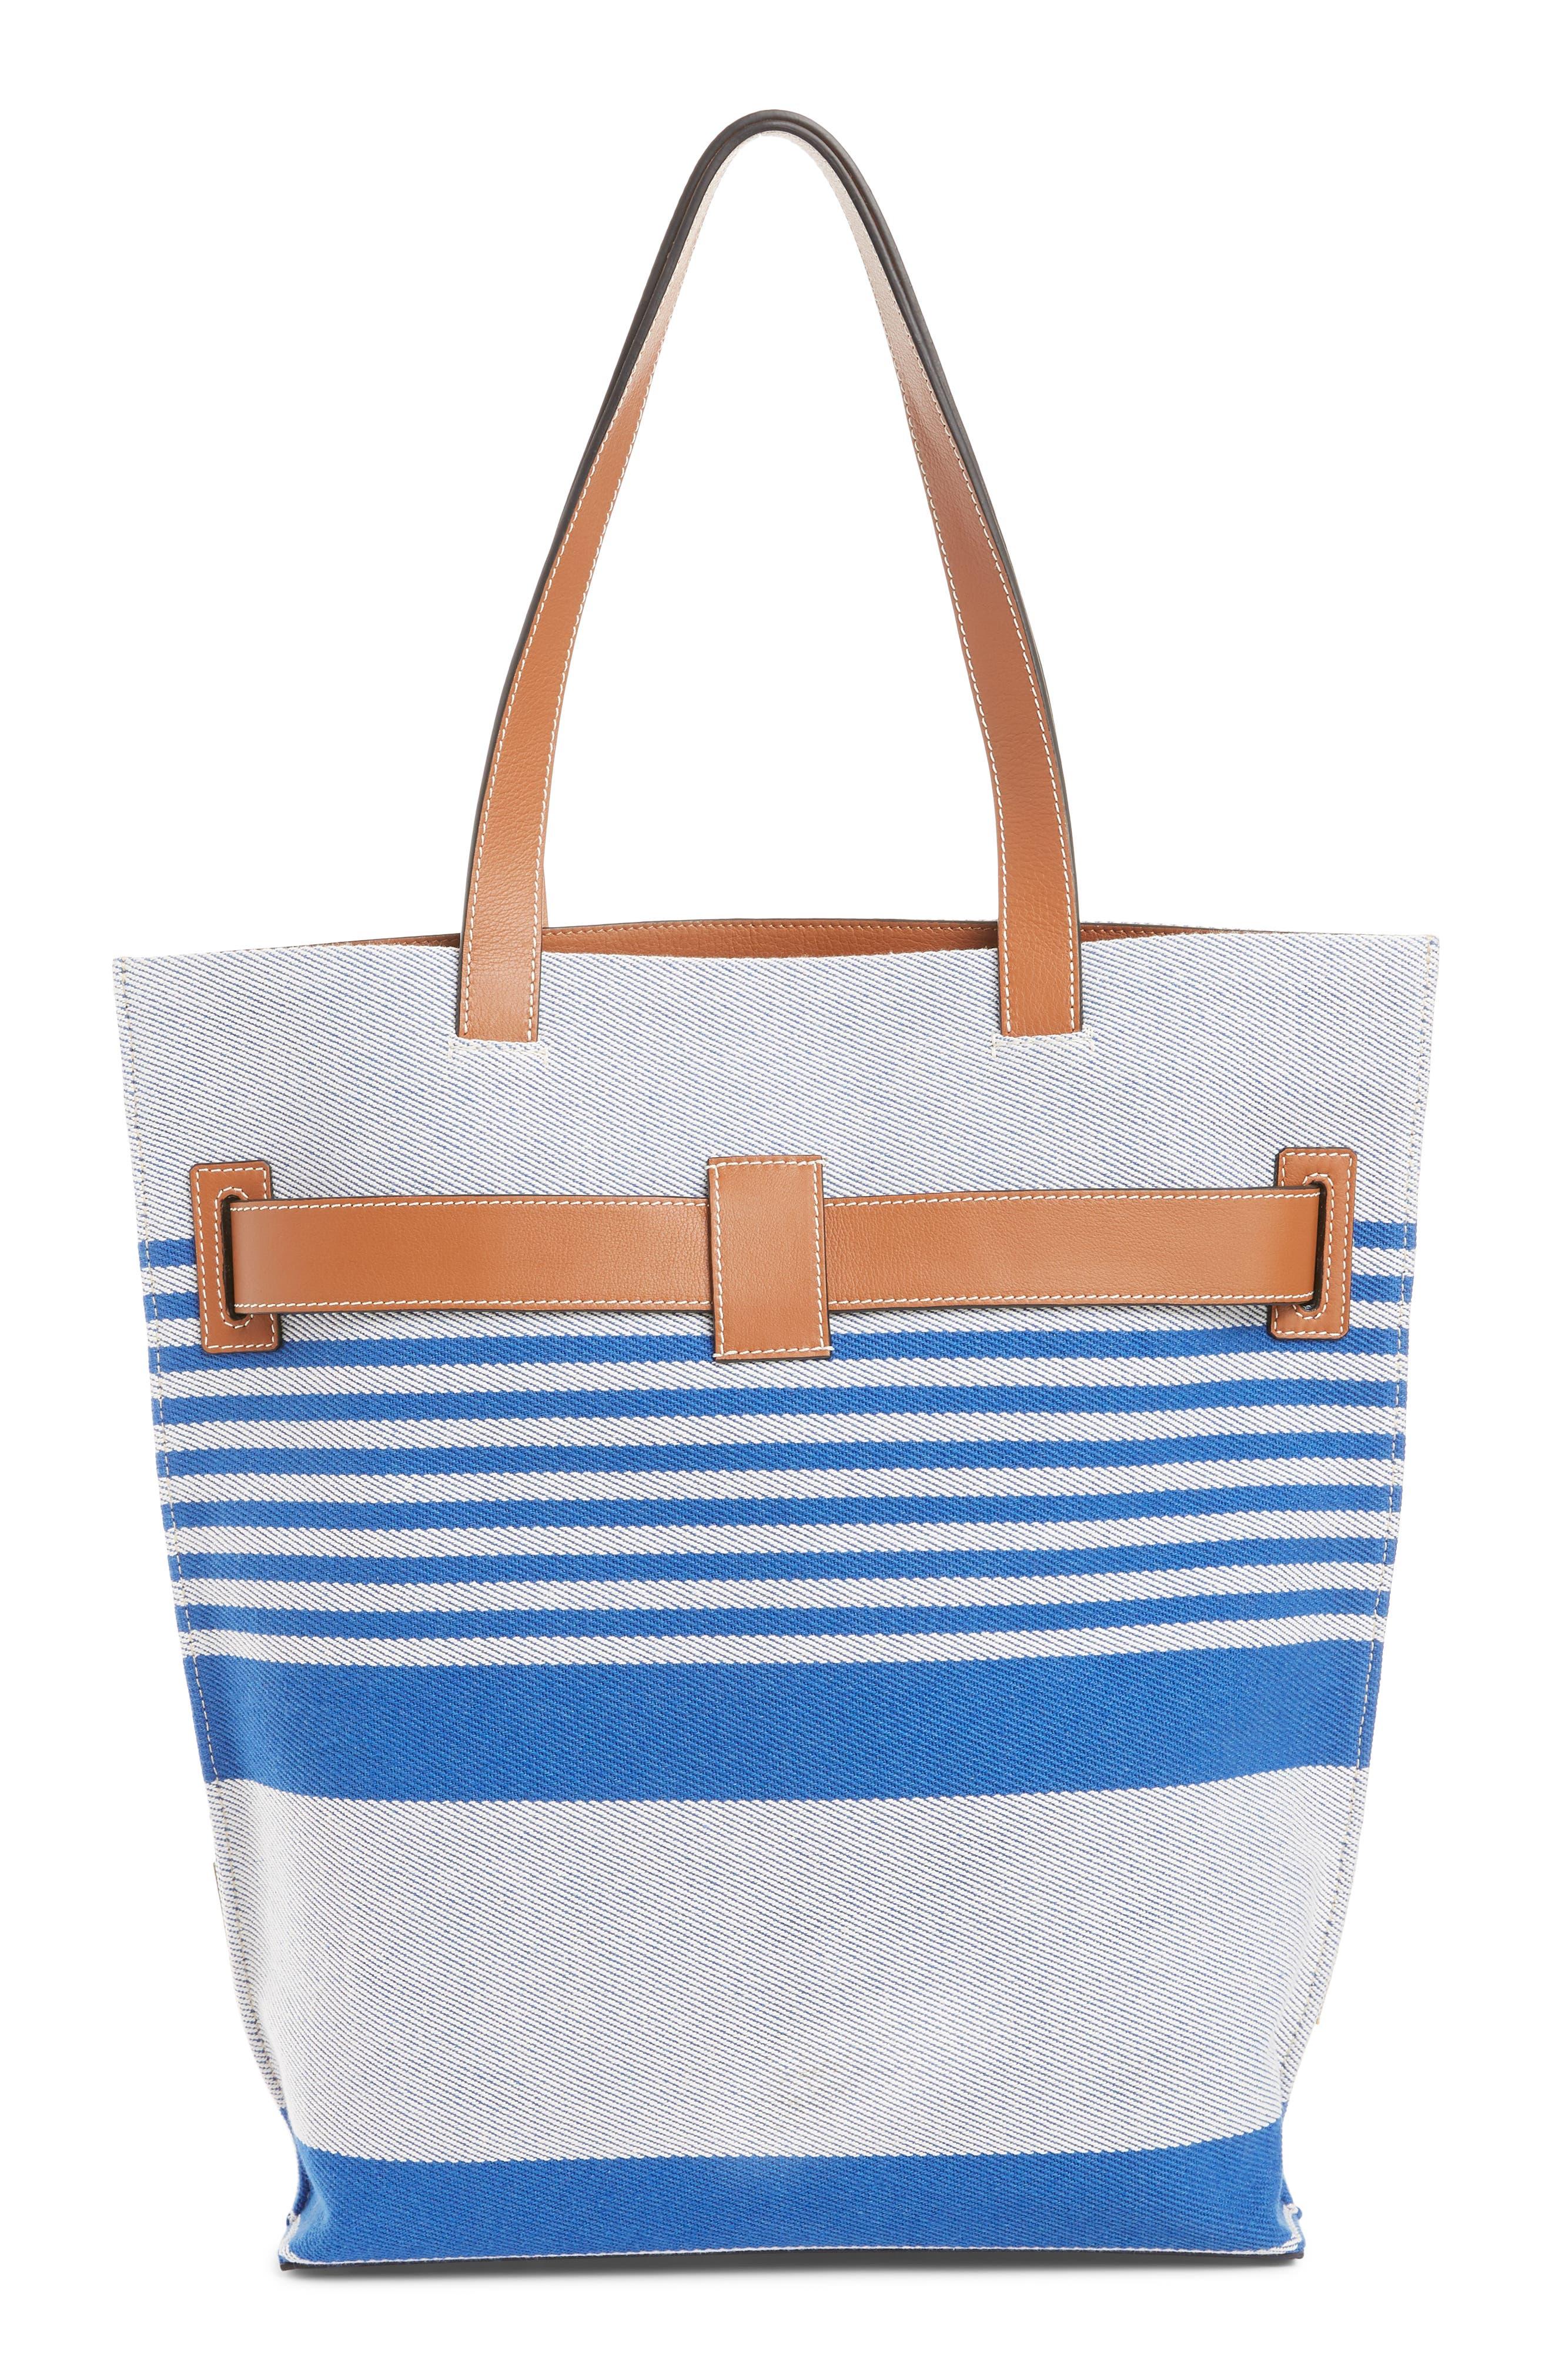 LOEWE, Stripe Twill Tote Bag, Alternate thumbnail 3, color, PACIFIC BLUE/MULTICOLOR